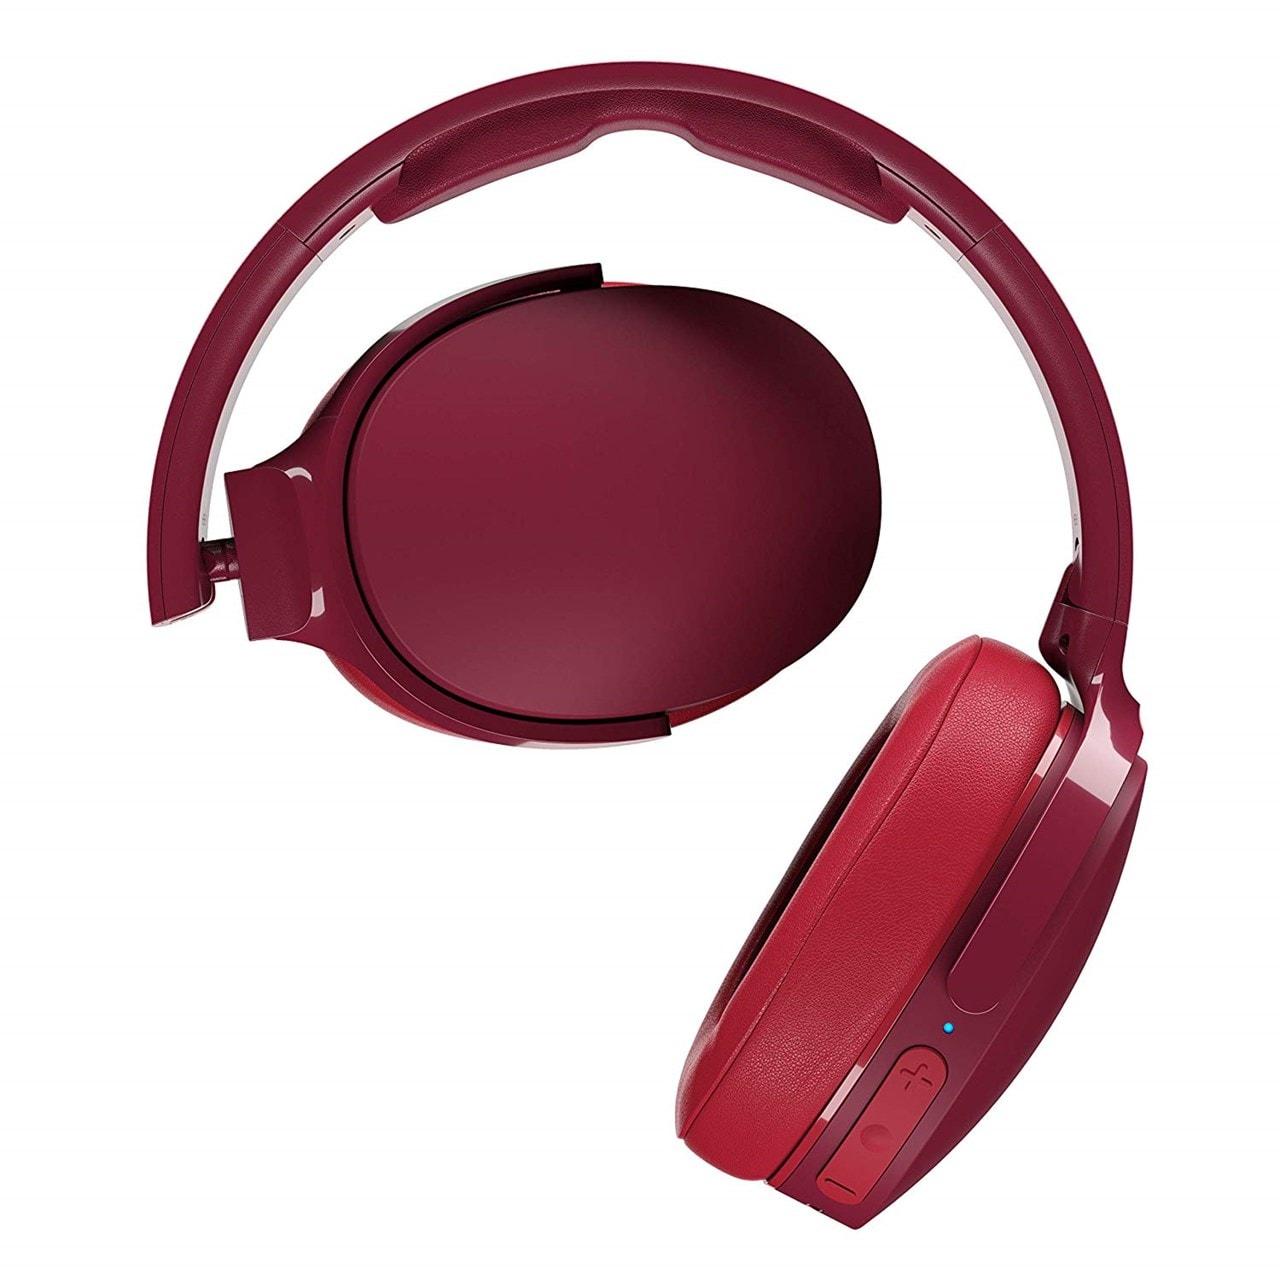 Skullcandy Hesh 3 Moab Red Bluetooth Headphones - 4